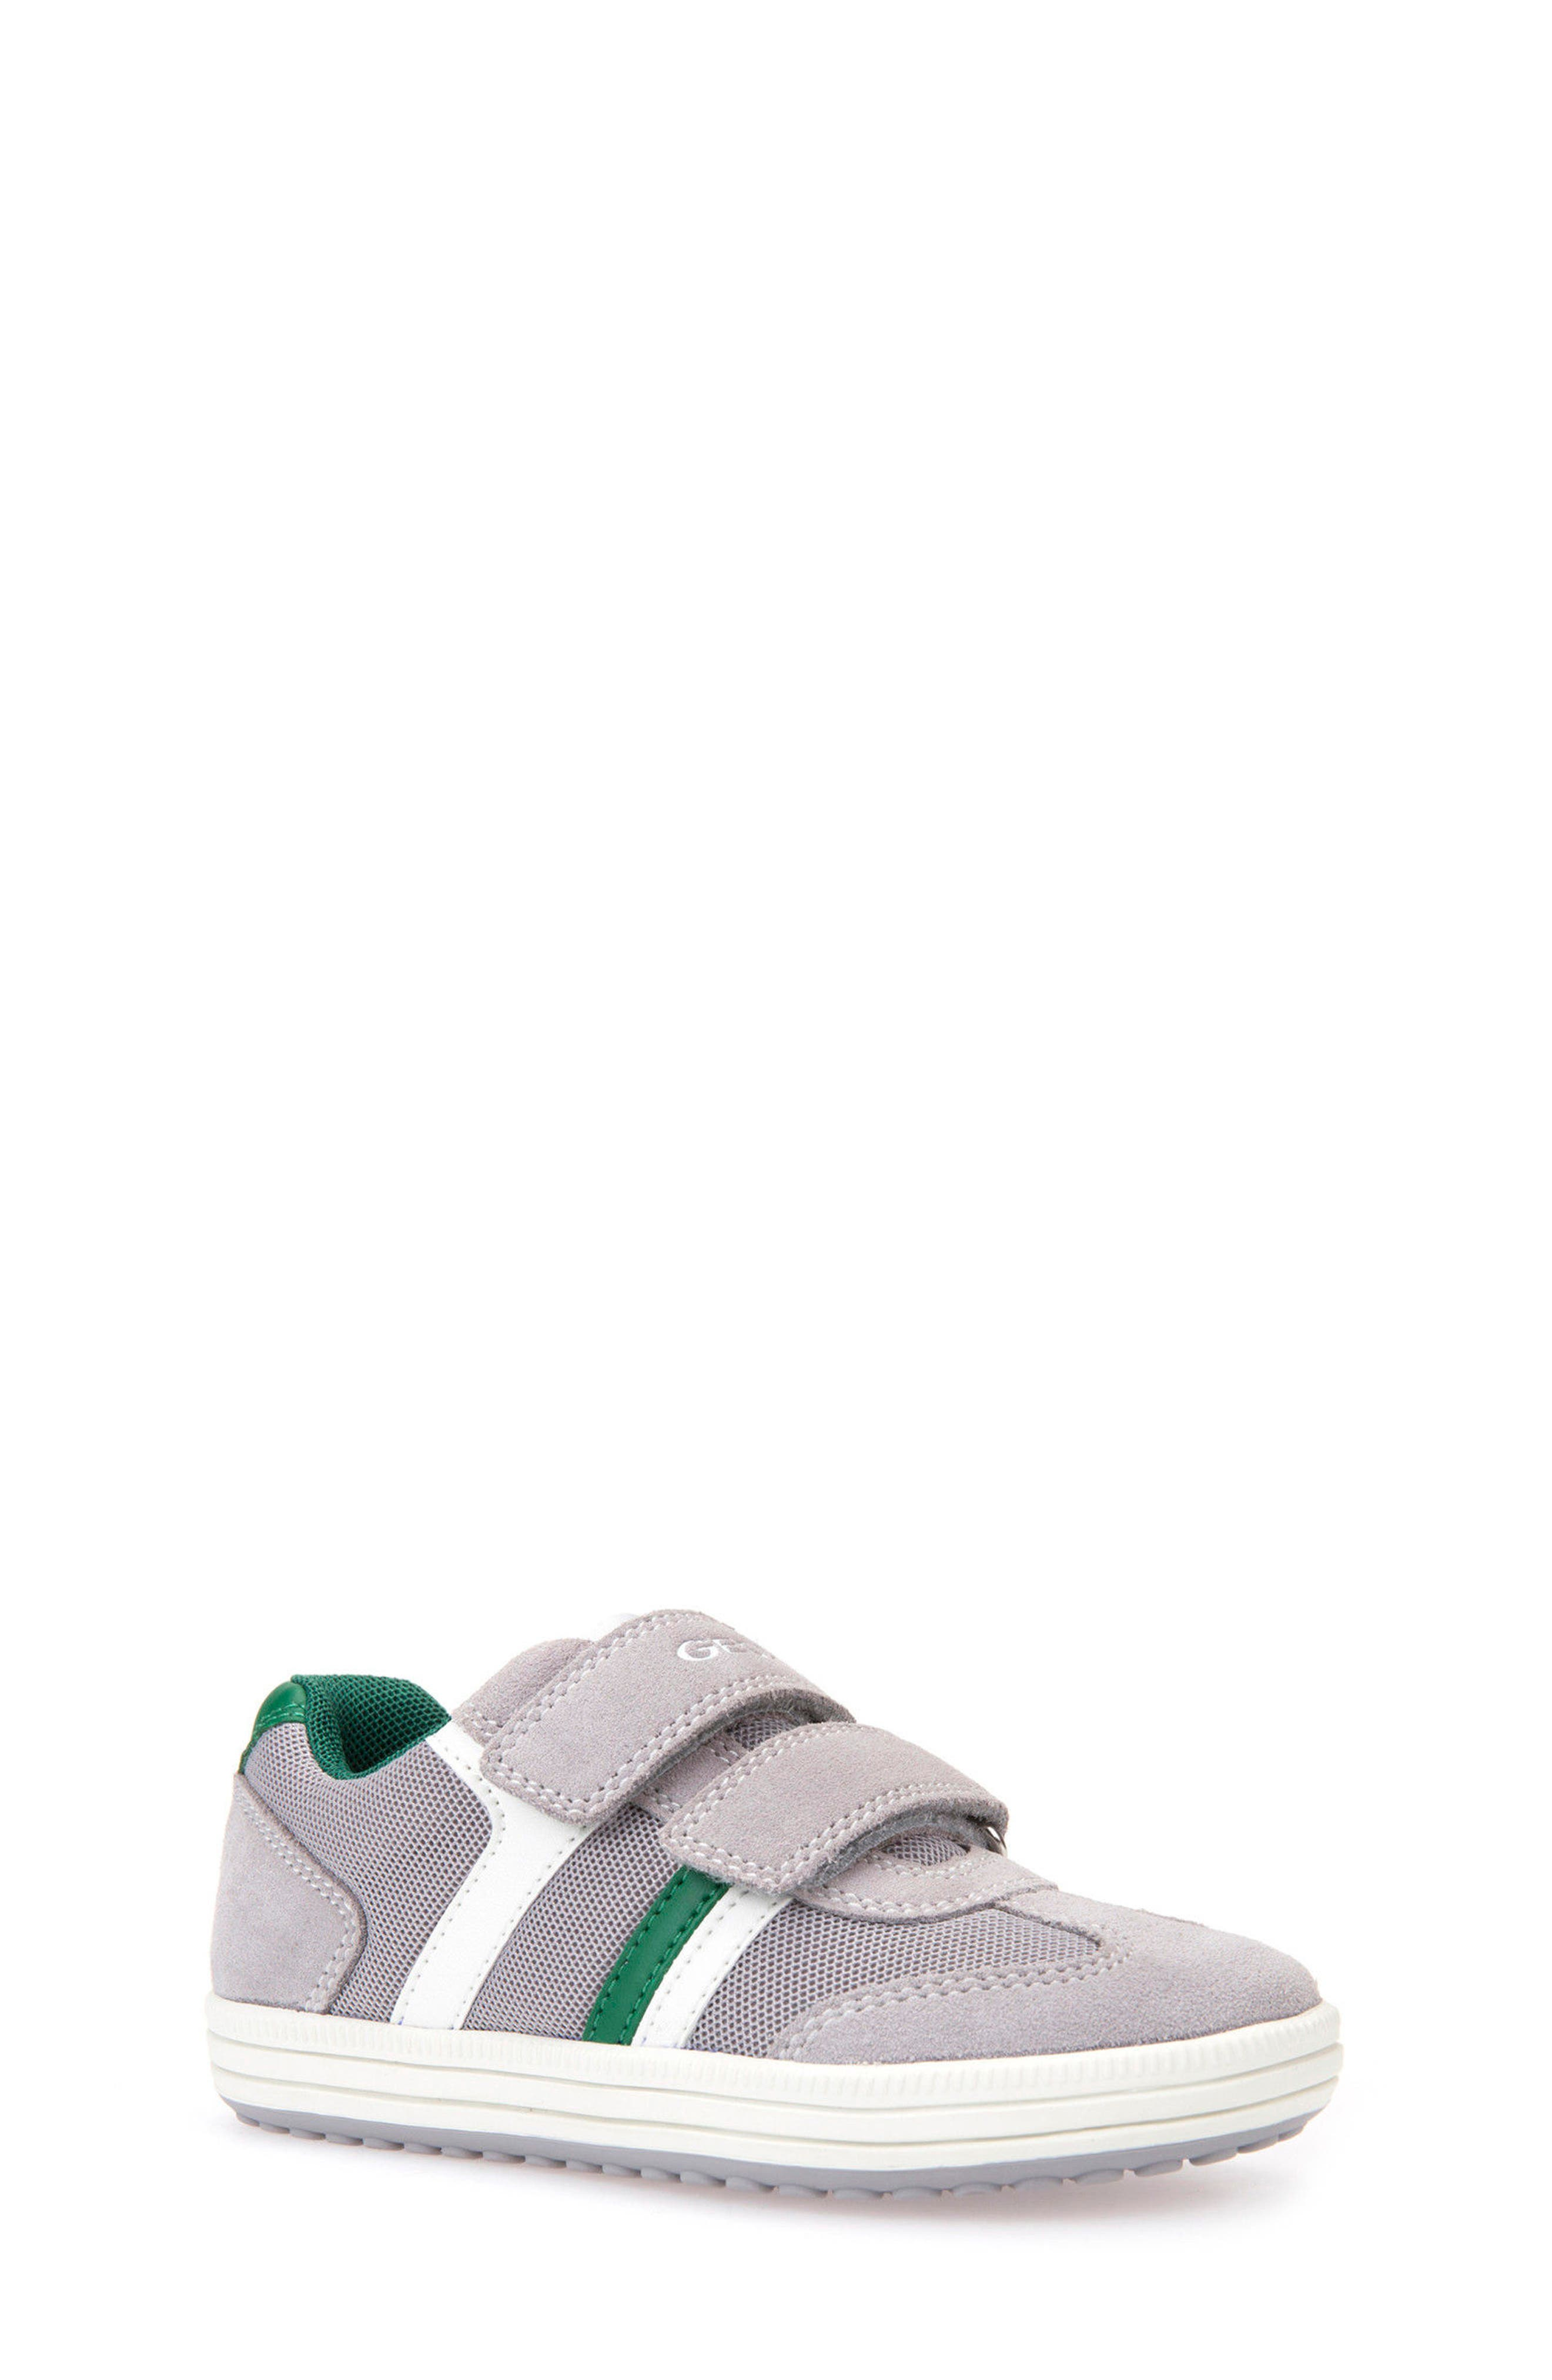 Kilwi Sneaker,                             Main thumbnail 1, color,                             GREY/ GREEN